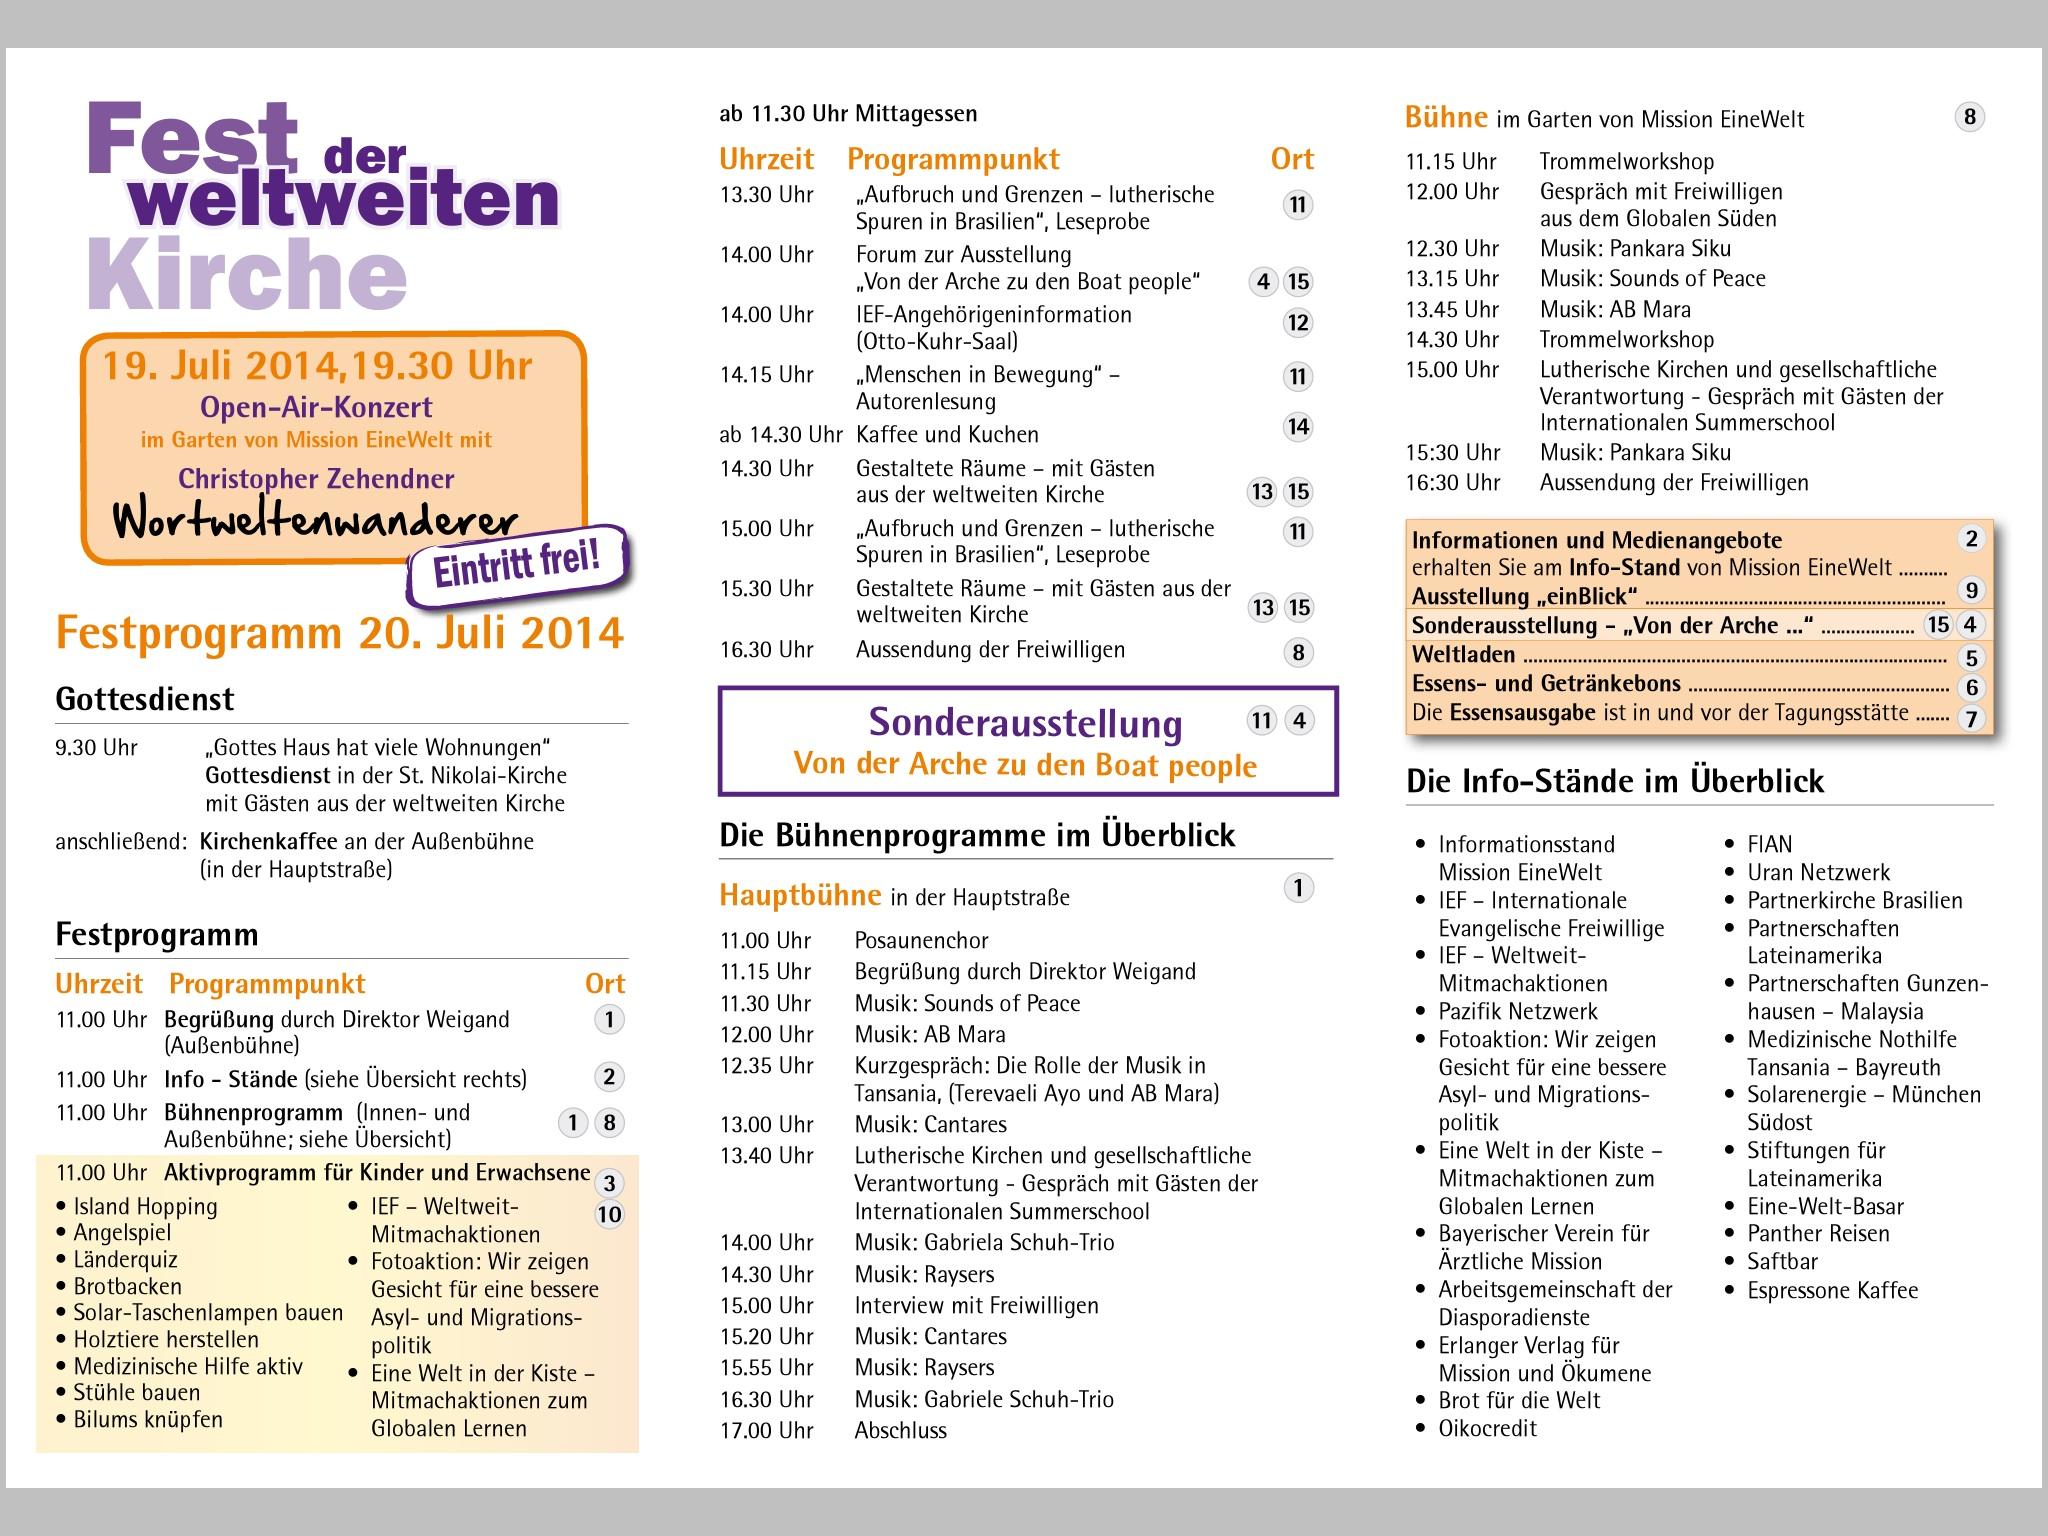 Programm 20.07.2014